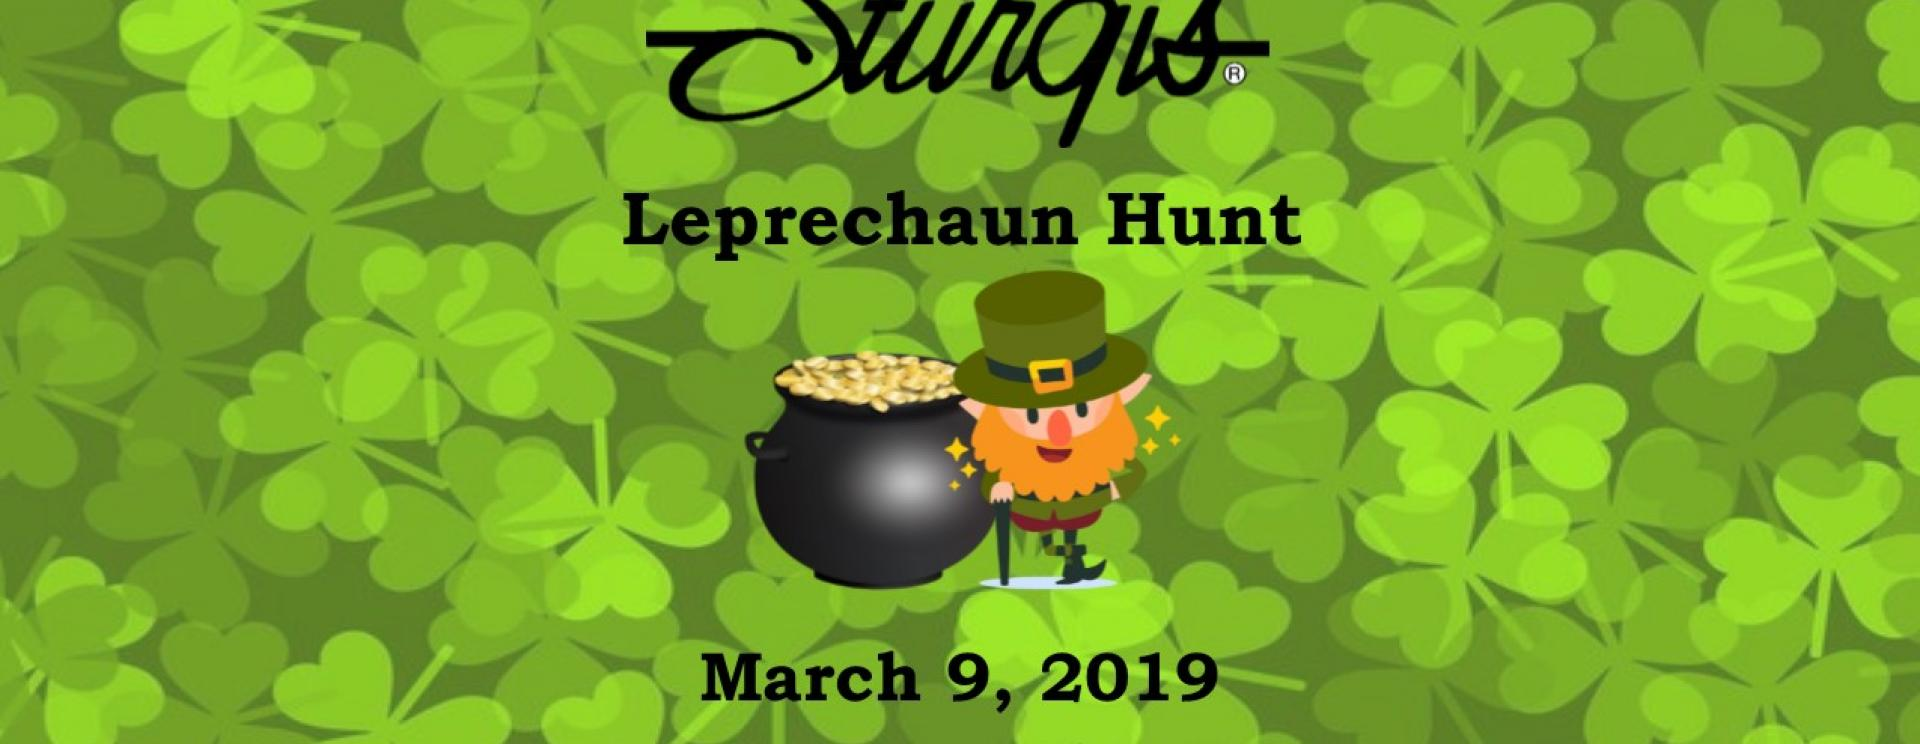 Sturgis Leprechaun Hunt